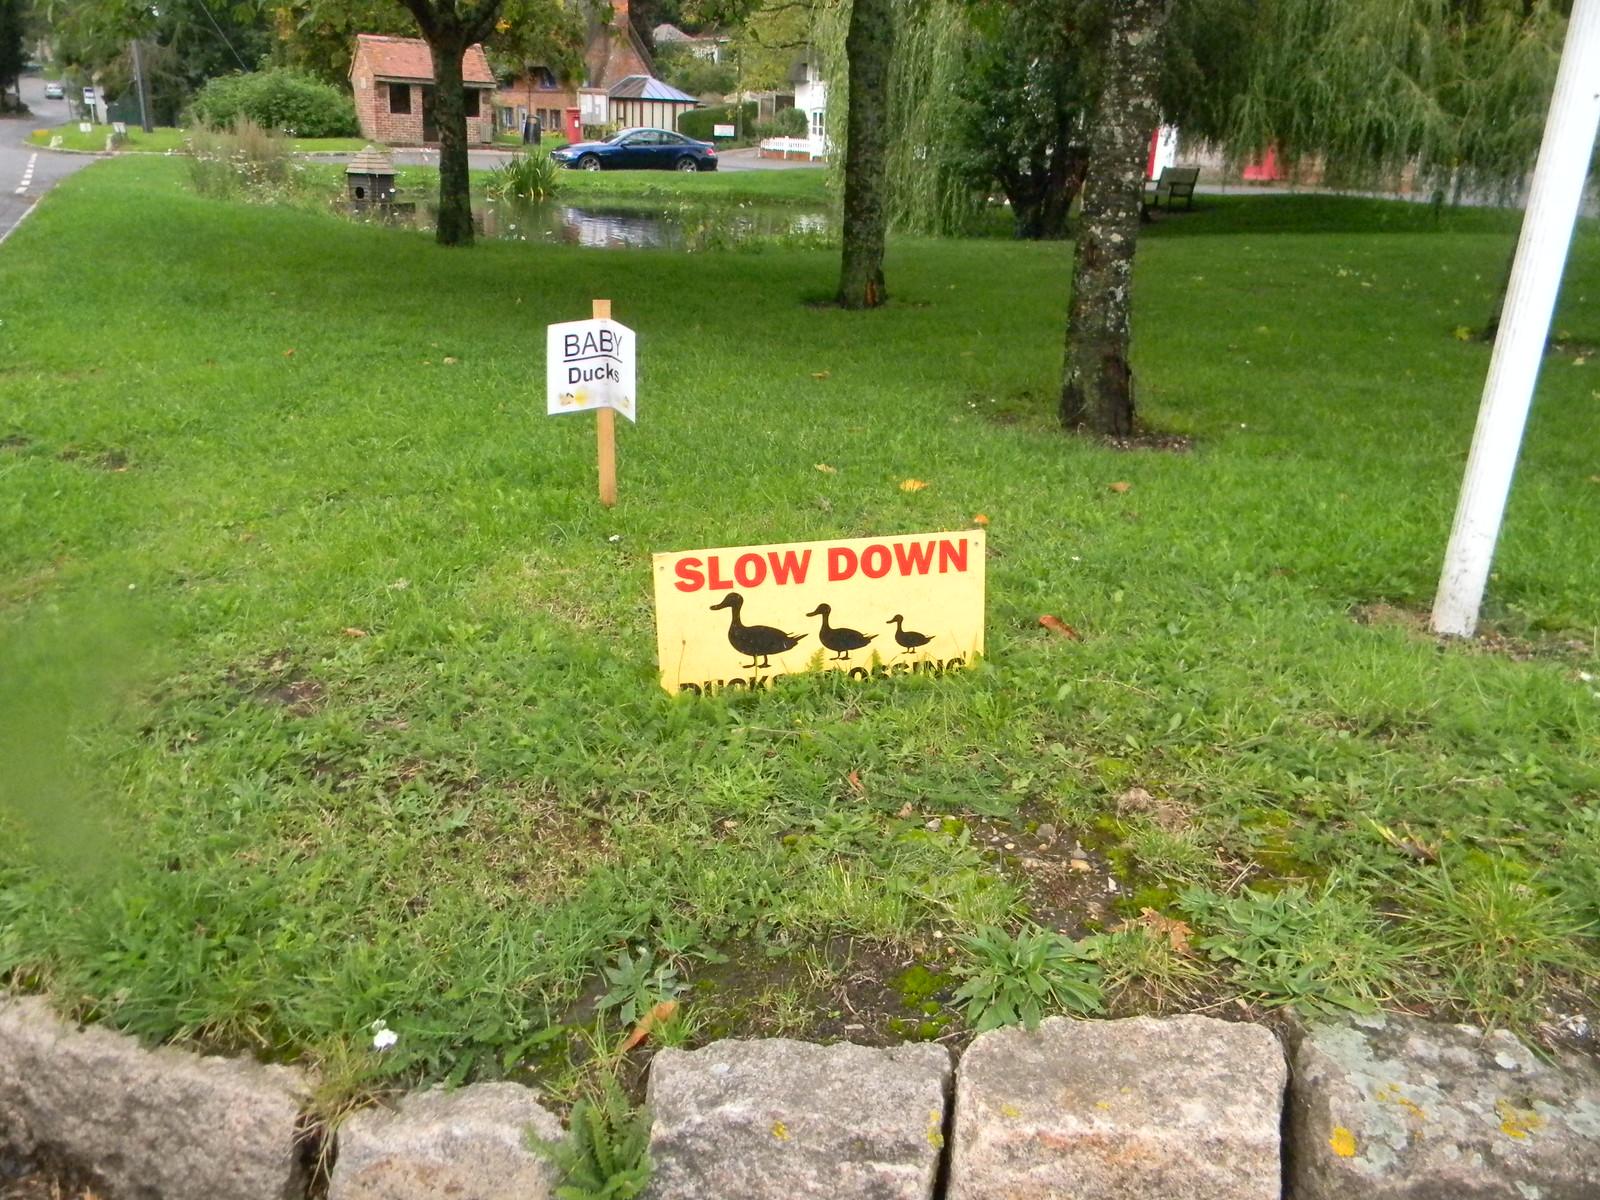 Duck signs. N Waltham Overton Circular